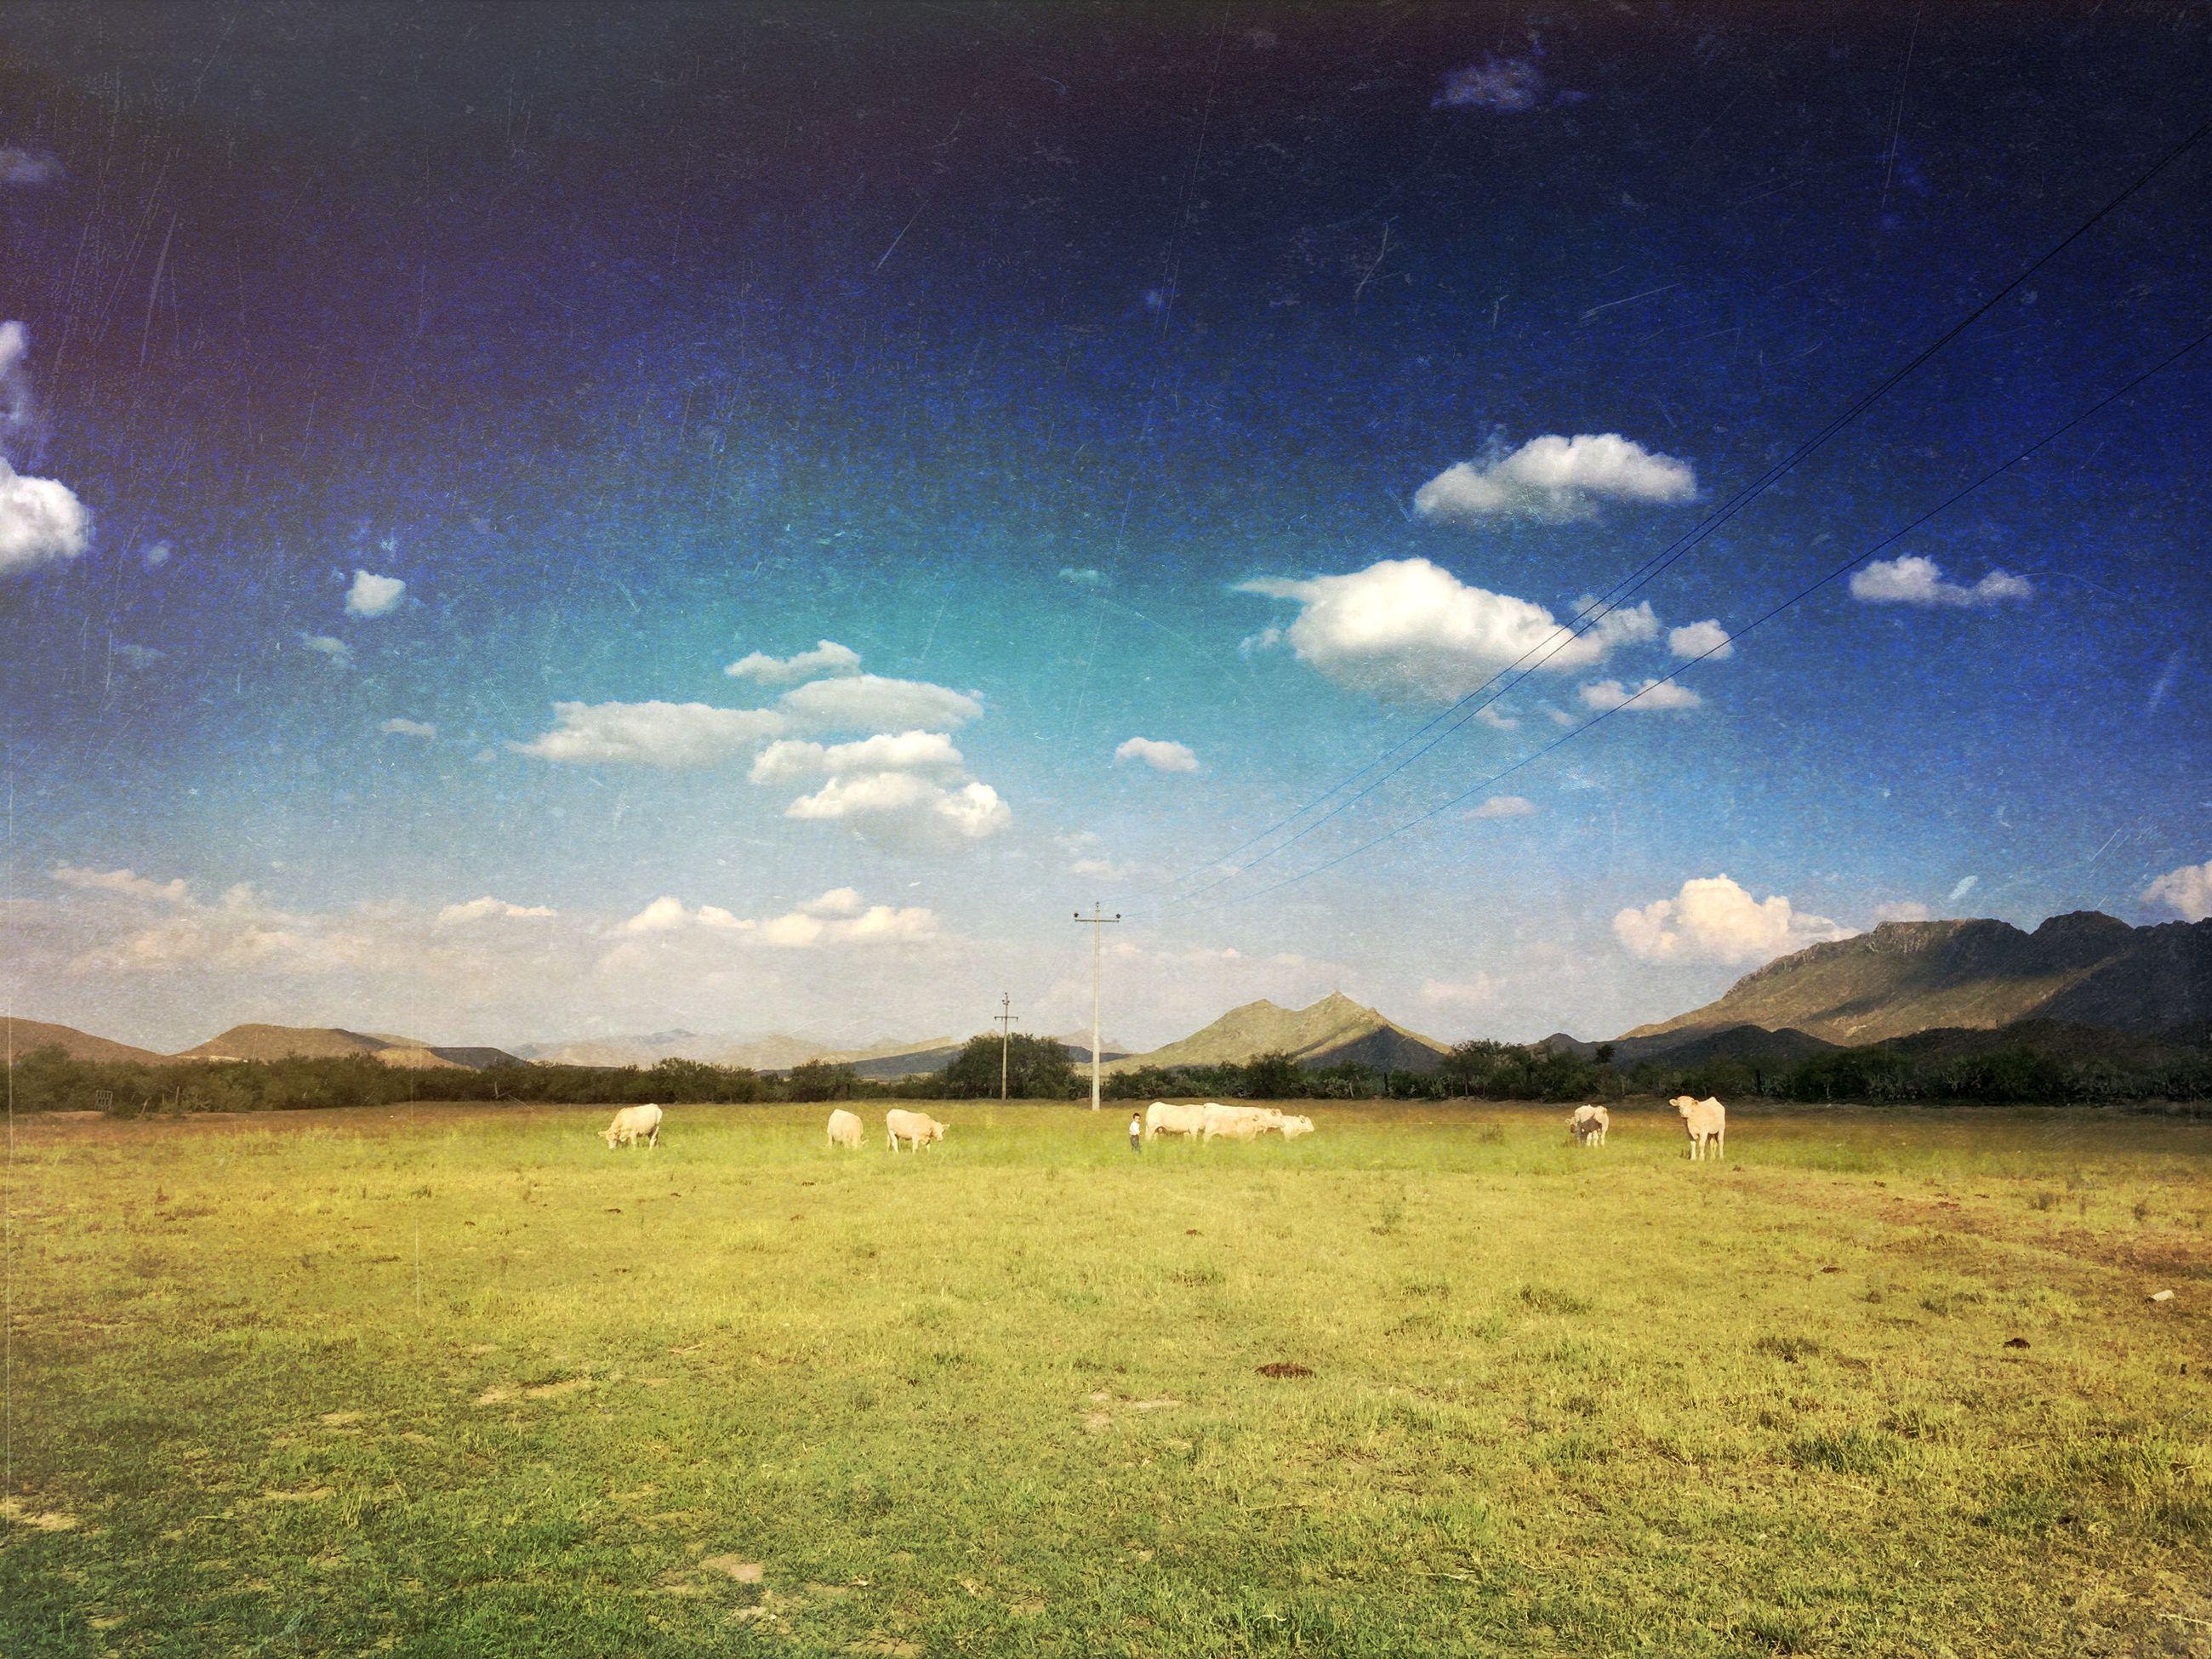 animal themes, mountain, sky, landscape, tranquil scene, tranquility, scenics, grass, domestic animals, mountain range, beauty in nature, field, nature, cloud - sky, livestock, cloud, mammal, grazing, non-urban scene, idyllic